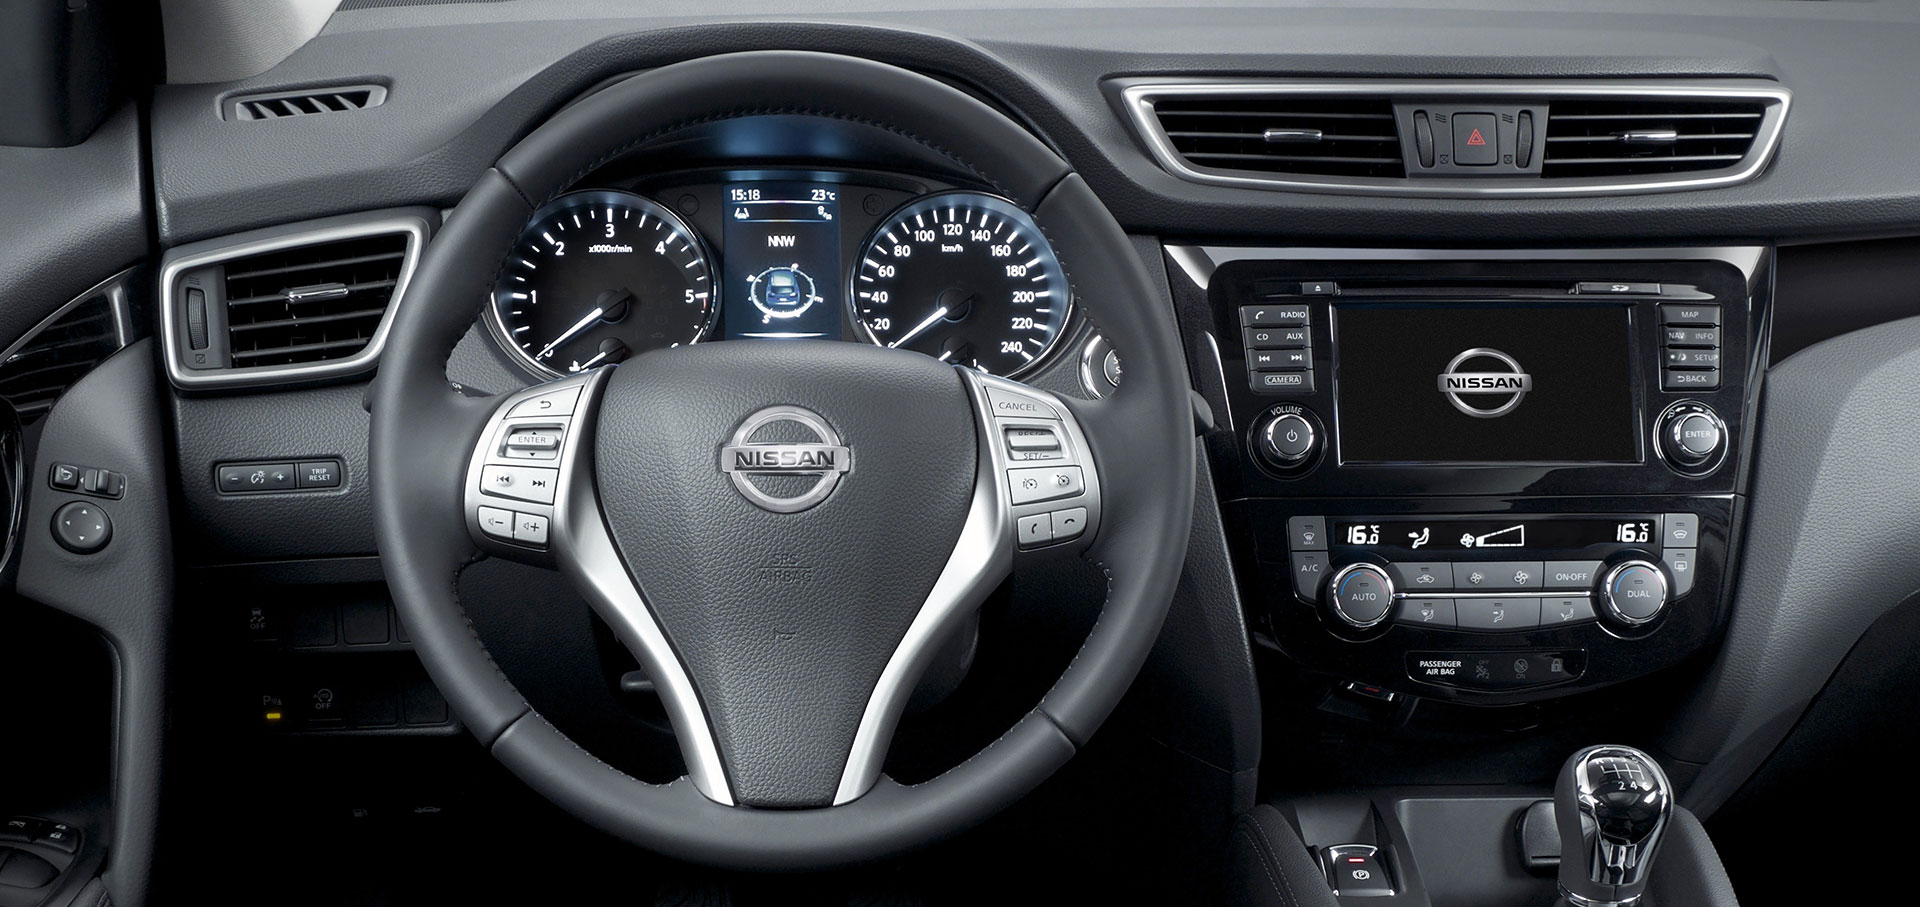 Nissan Qashqai Interior - Dashboard and IP - Car Body Design